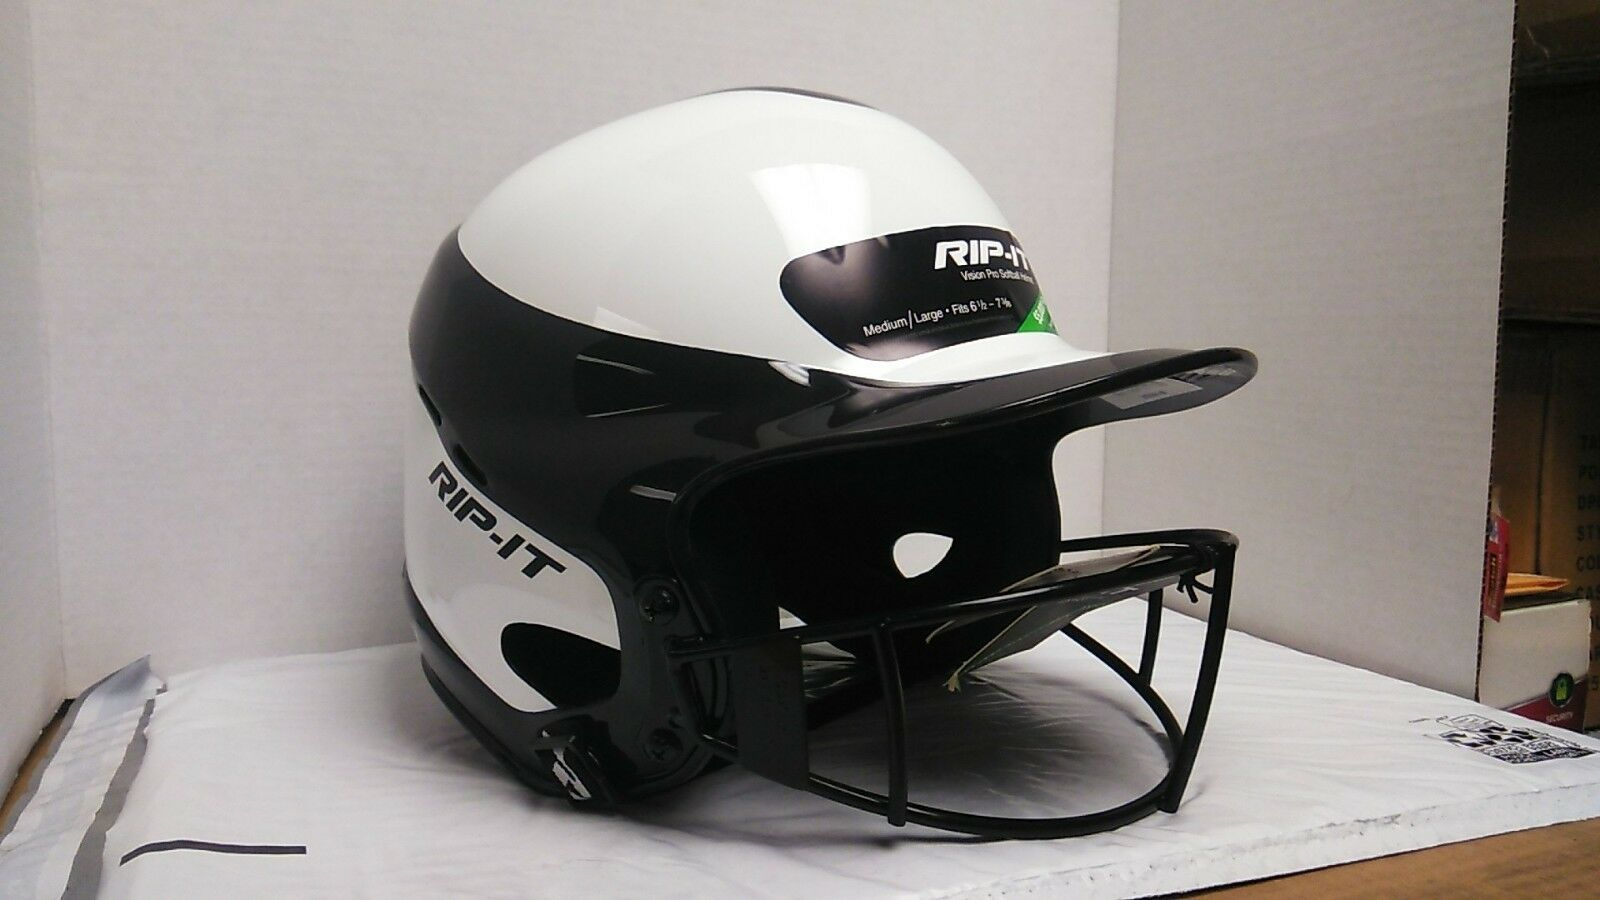 Rip It Vision Pro M-L Softball Helmet New